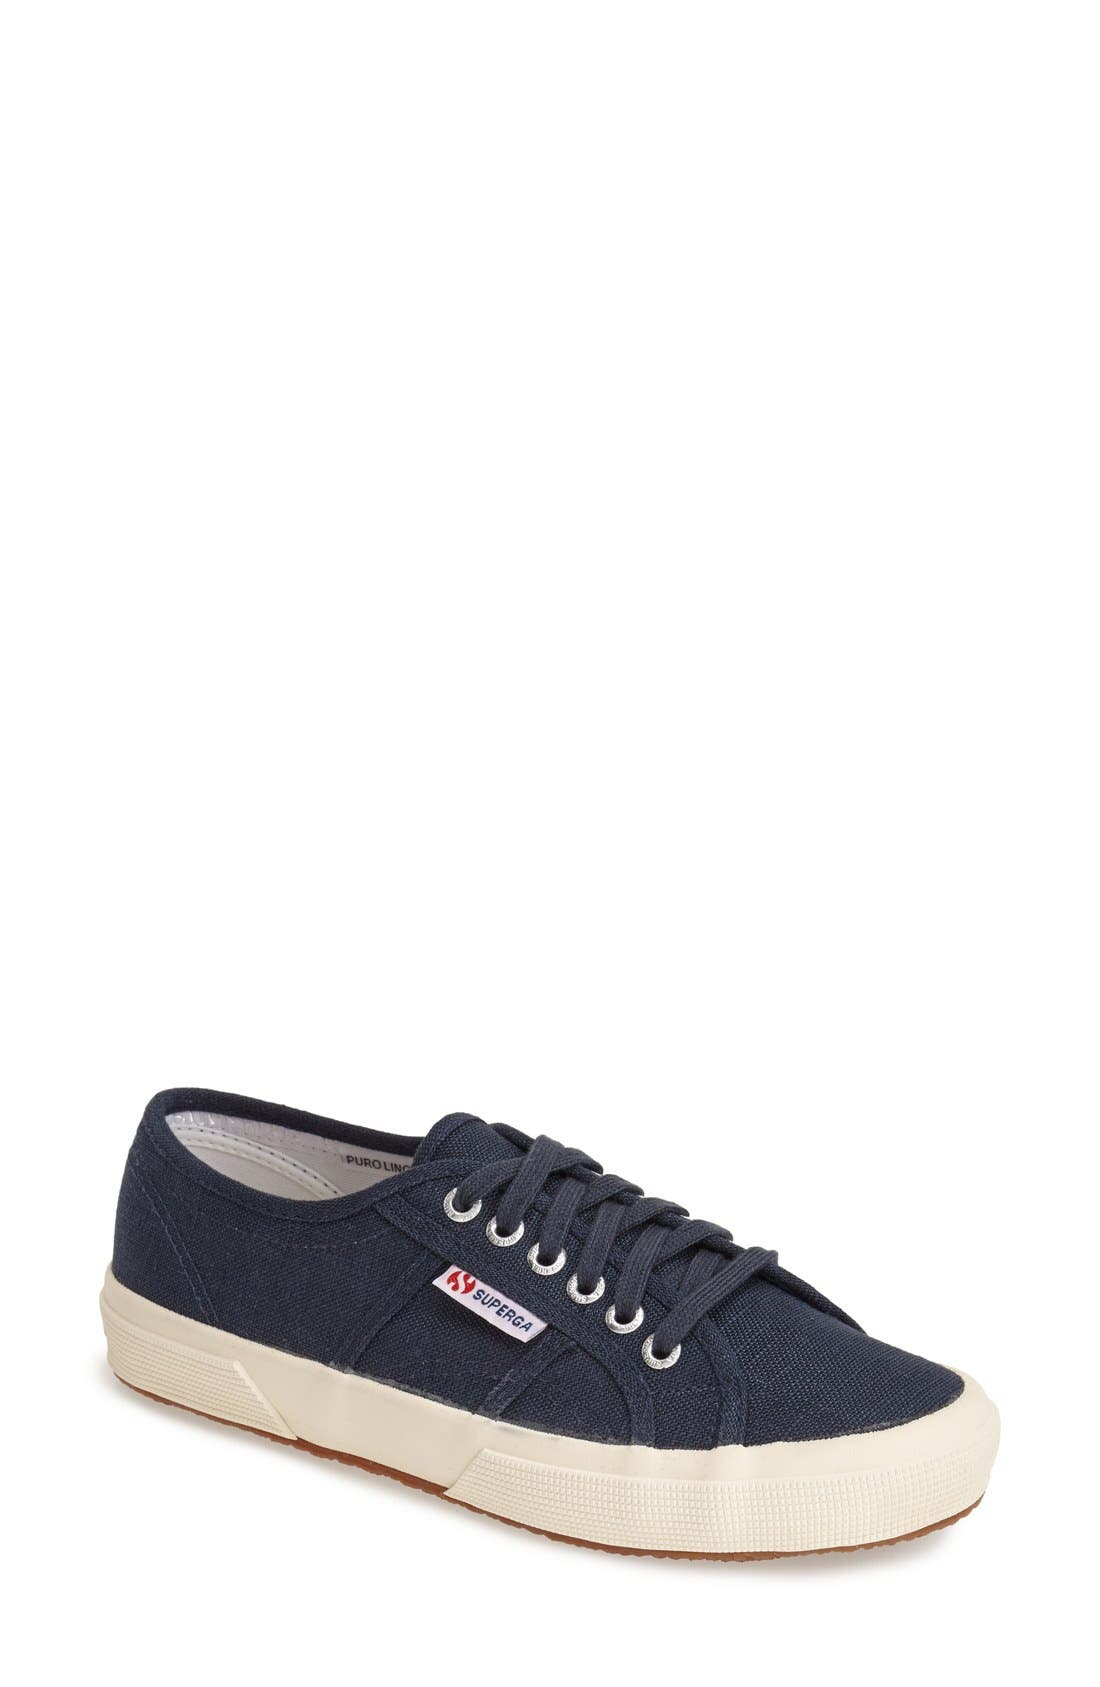 Alternate Image 1 Selected - Superga 'Linu' Linen Sneaker (Women)